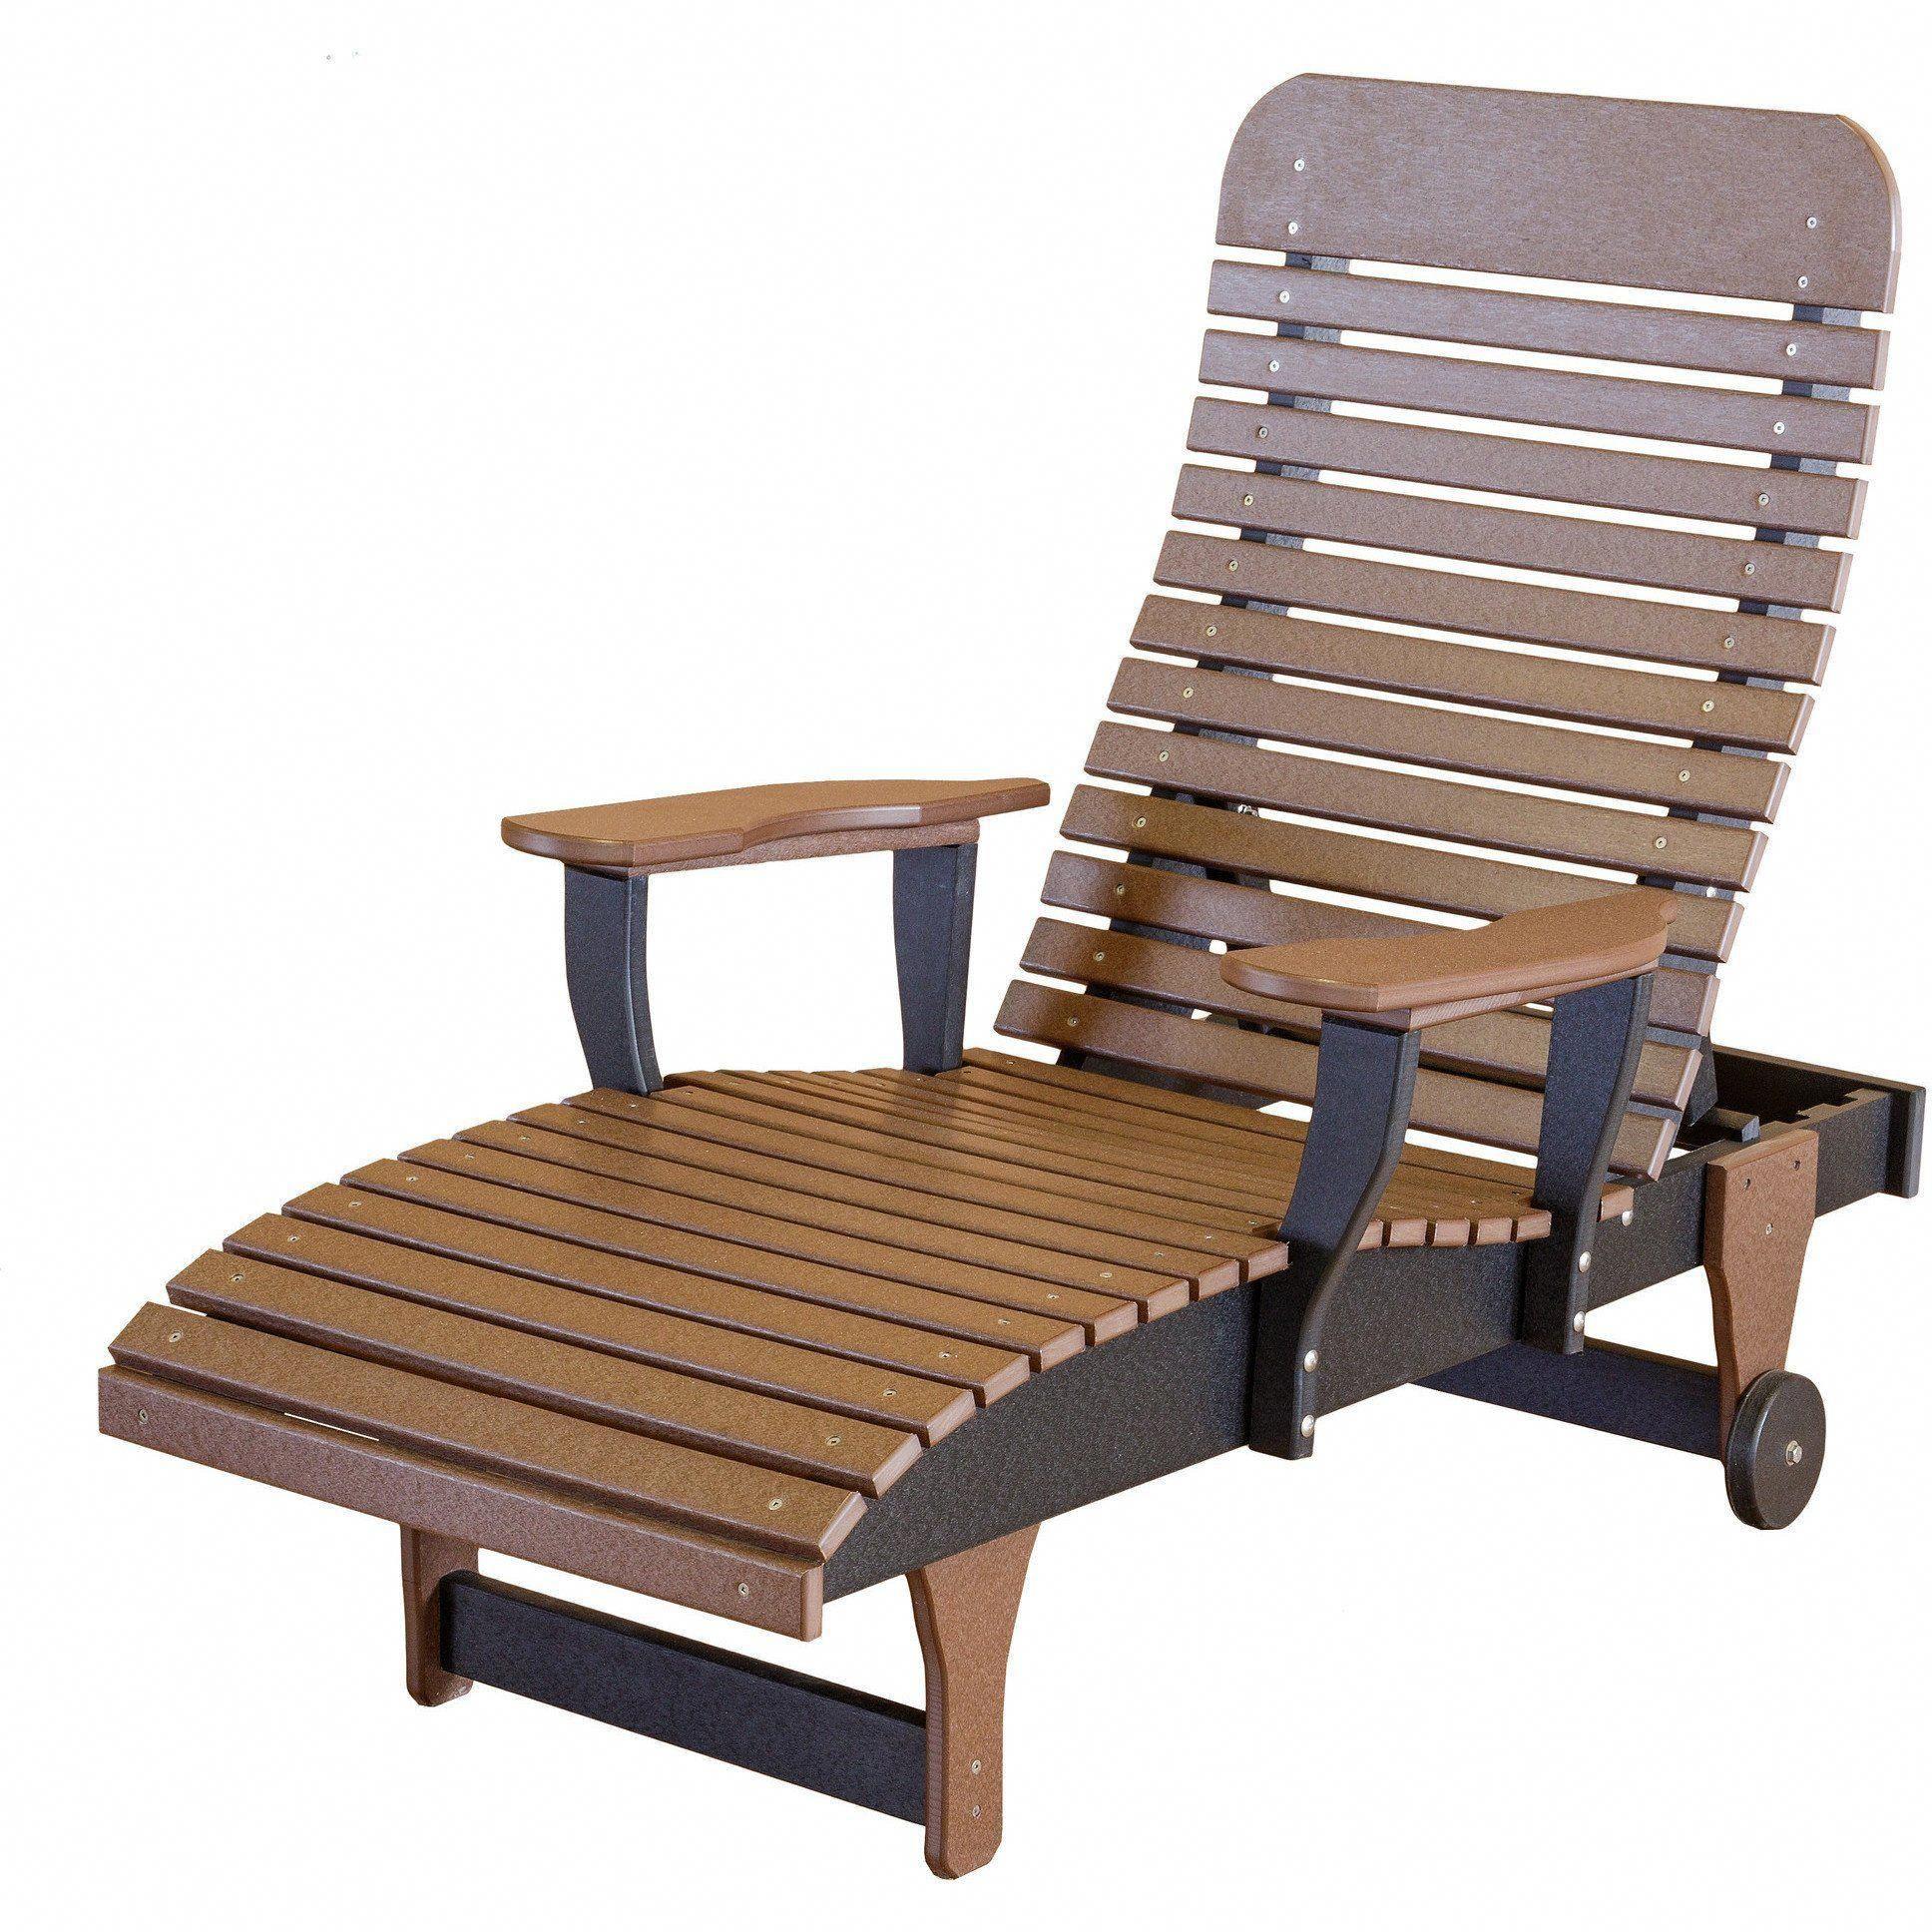 Wildridge Recycled Plastic Heritage Chaise Lounge Lead